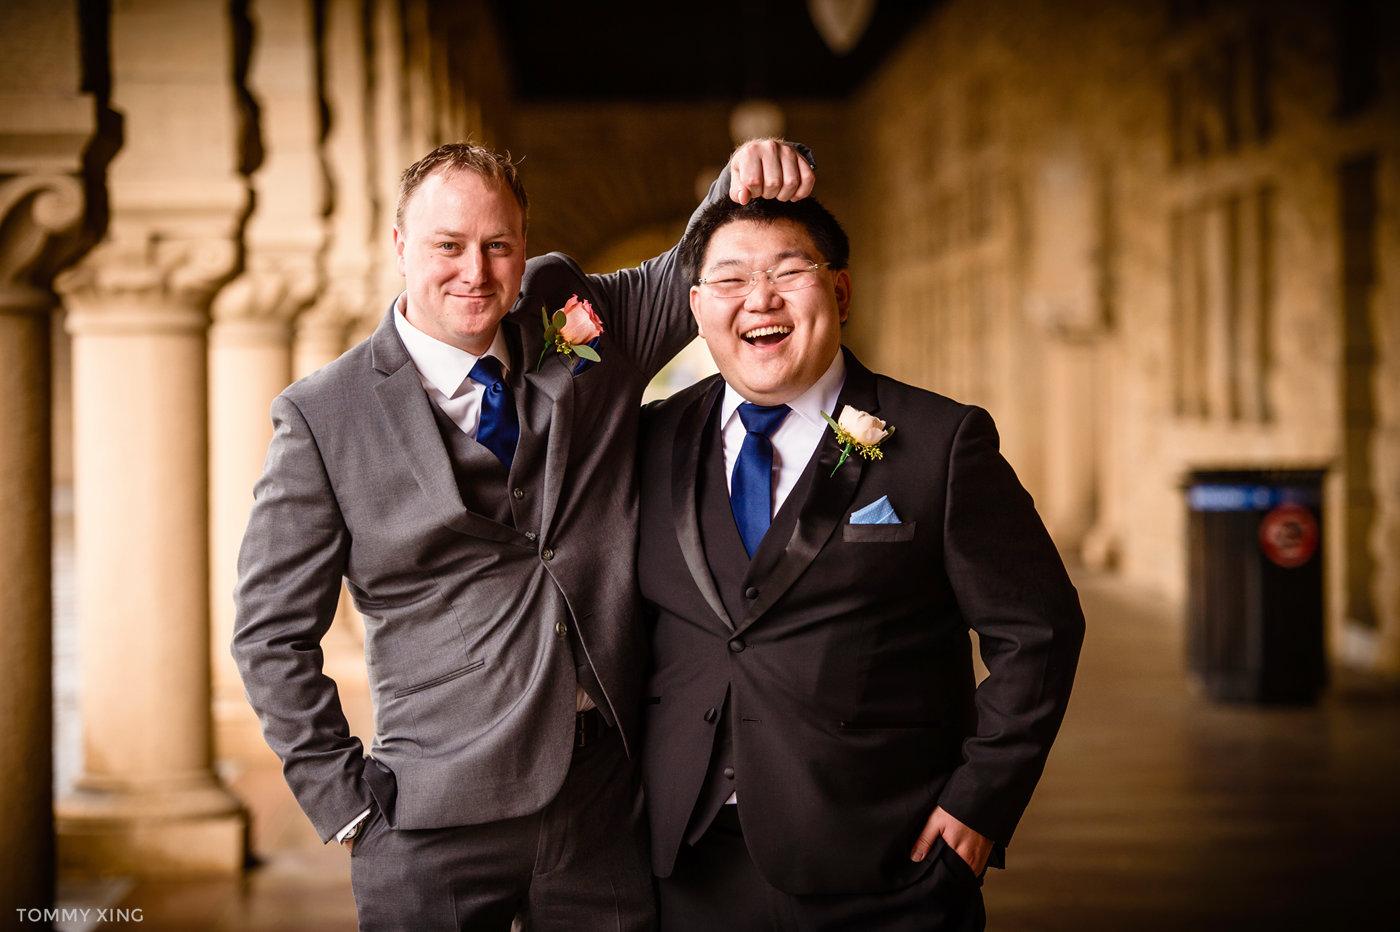 STANFORD MEMORIAL CHURCH WEDDING - Wenjie & Chengcheng - SAN FRANCISCO BAY AREA 斯坦福教堂婚礼跟拍 - 洛杉矶婚礼婚纱照摄影师 Tommy Xing Photography141.jpg